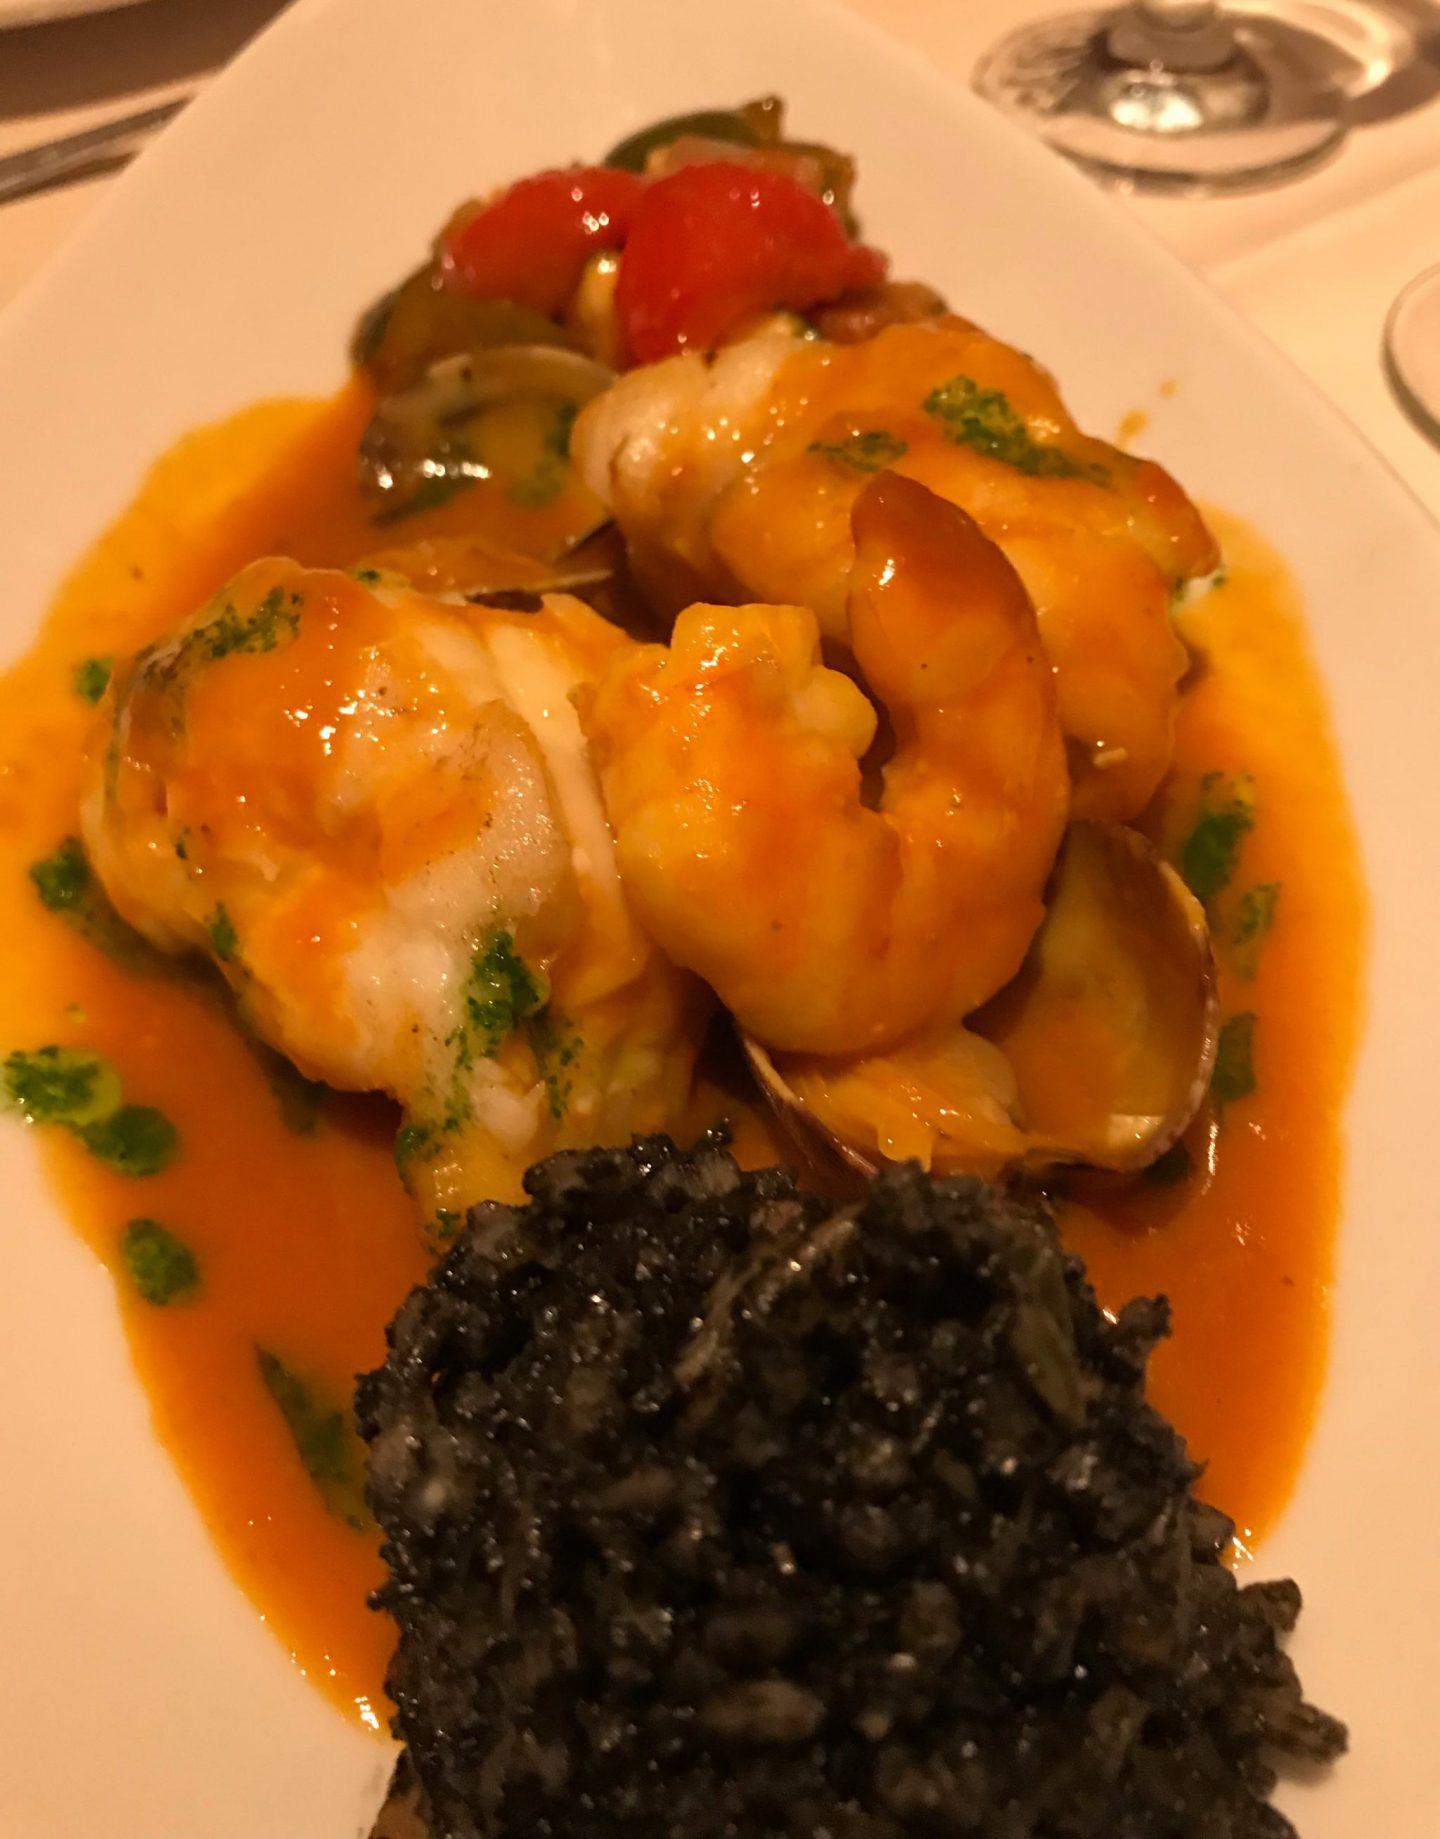 Erfahrung Bewertung Kritik Tapas Seeteufel Safran schwarzer Reis El Olivo Recklinghausen Foodblog Sternestulle